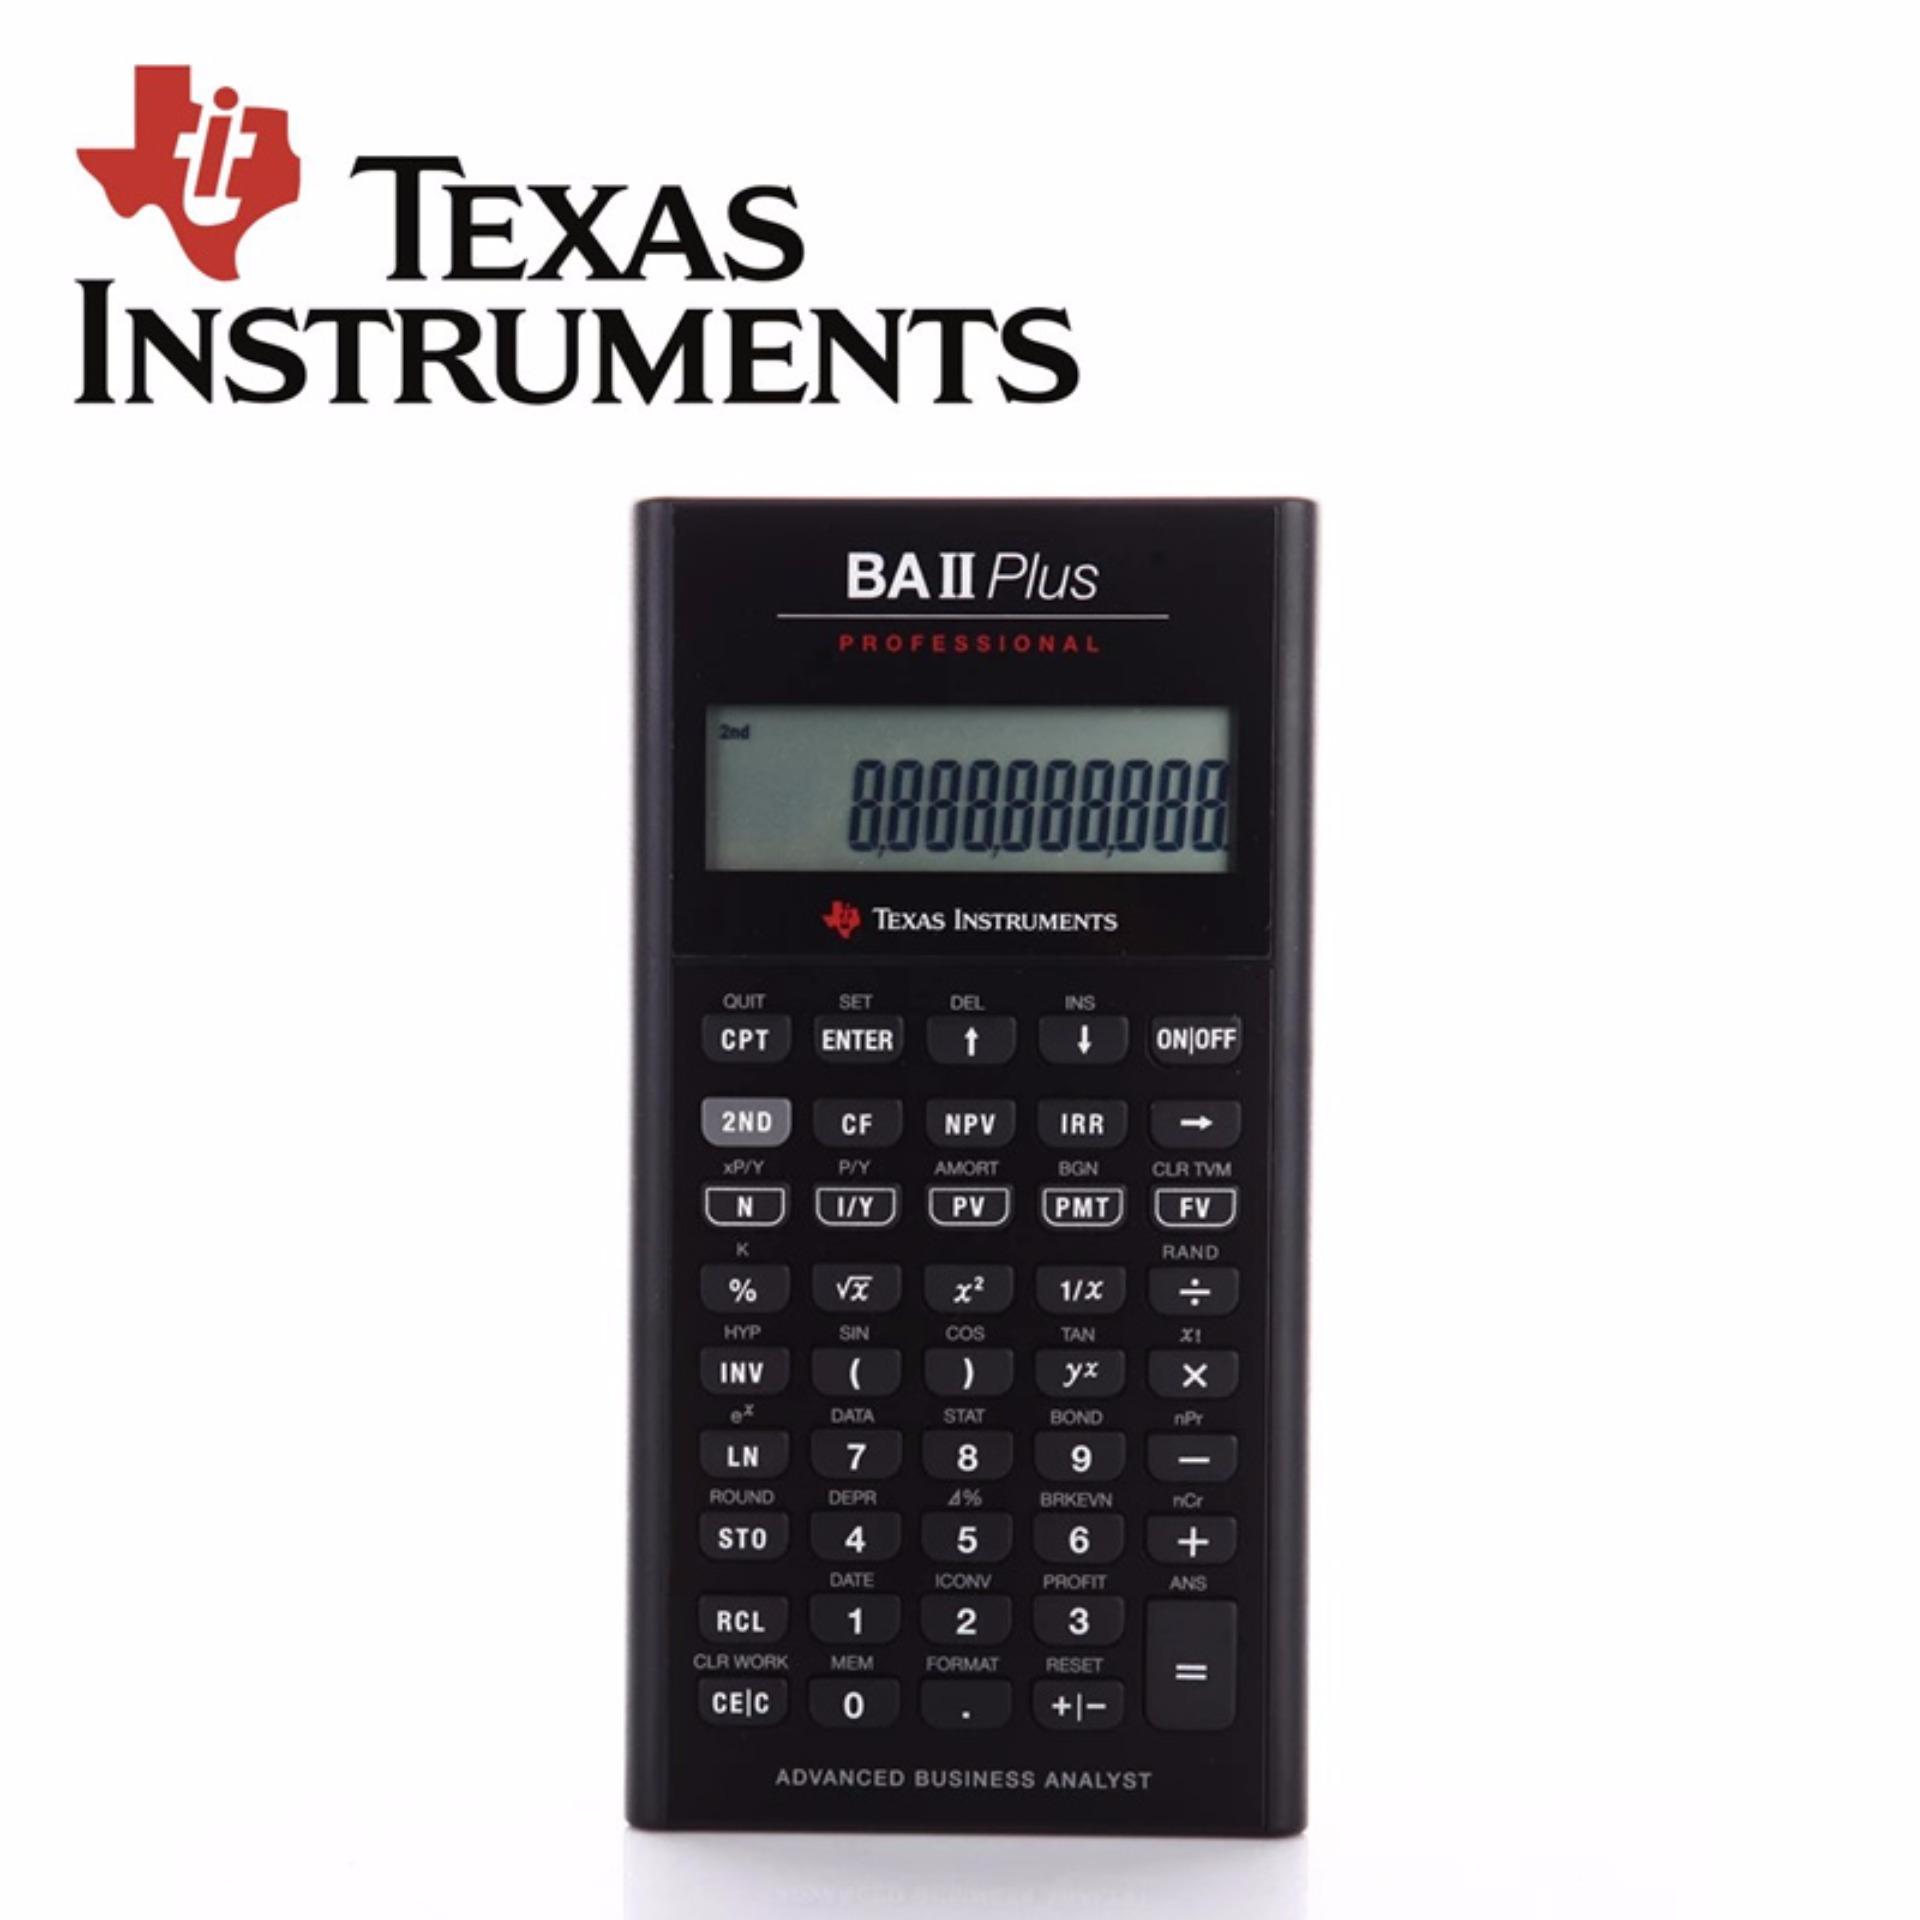 Texas Instruments Ti Ba Ii Plus Professional Financial Calculator For Cfa Intl Price